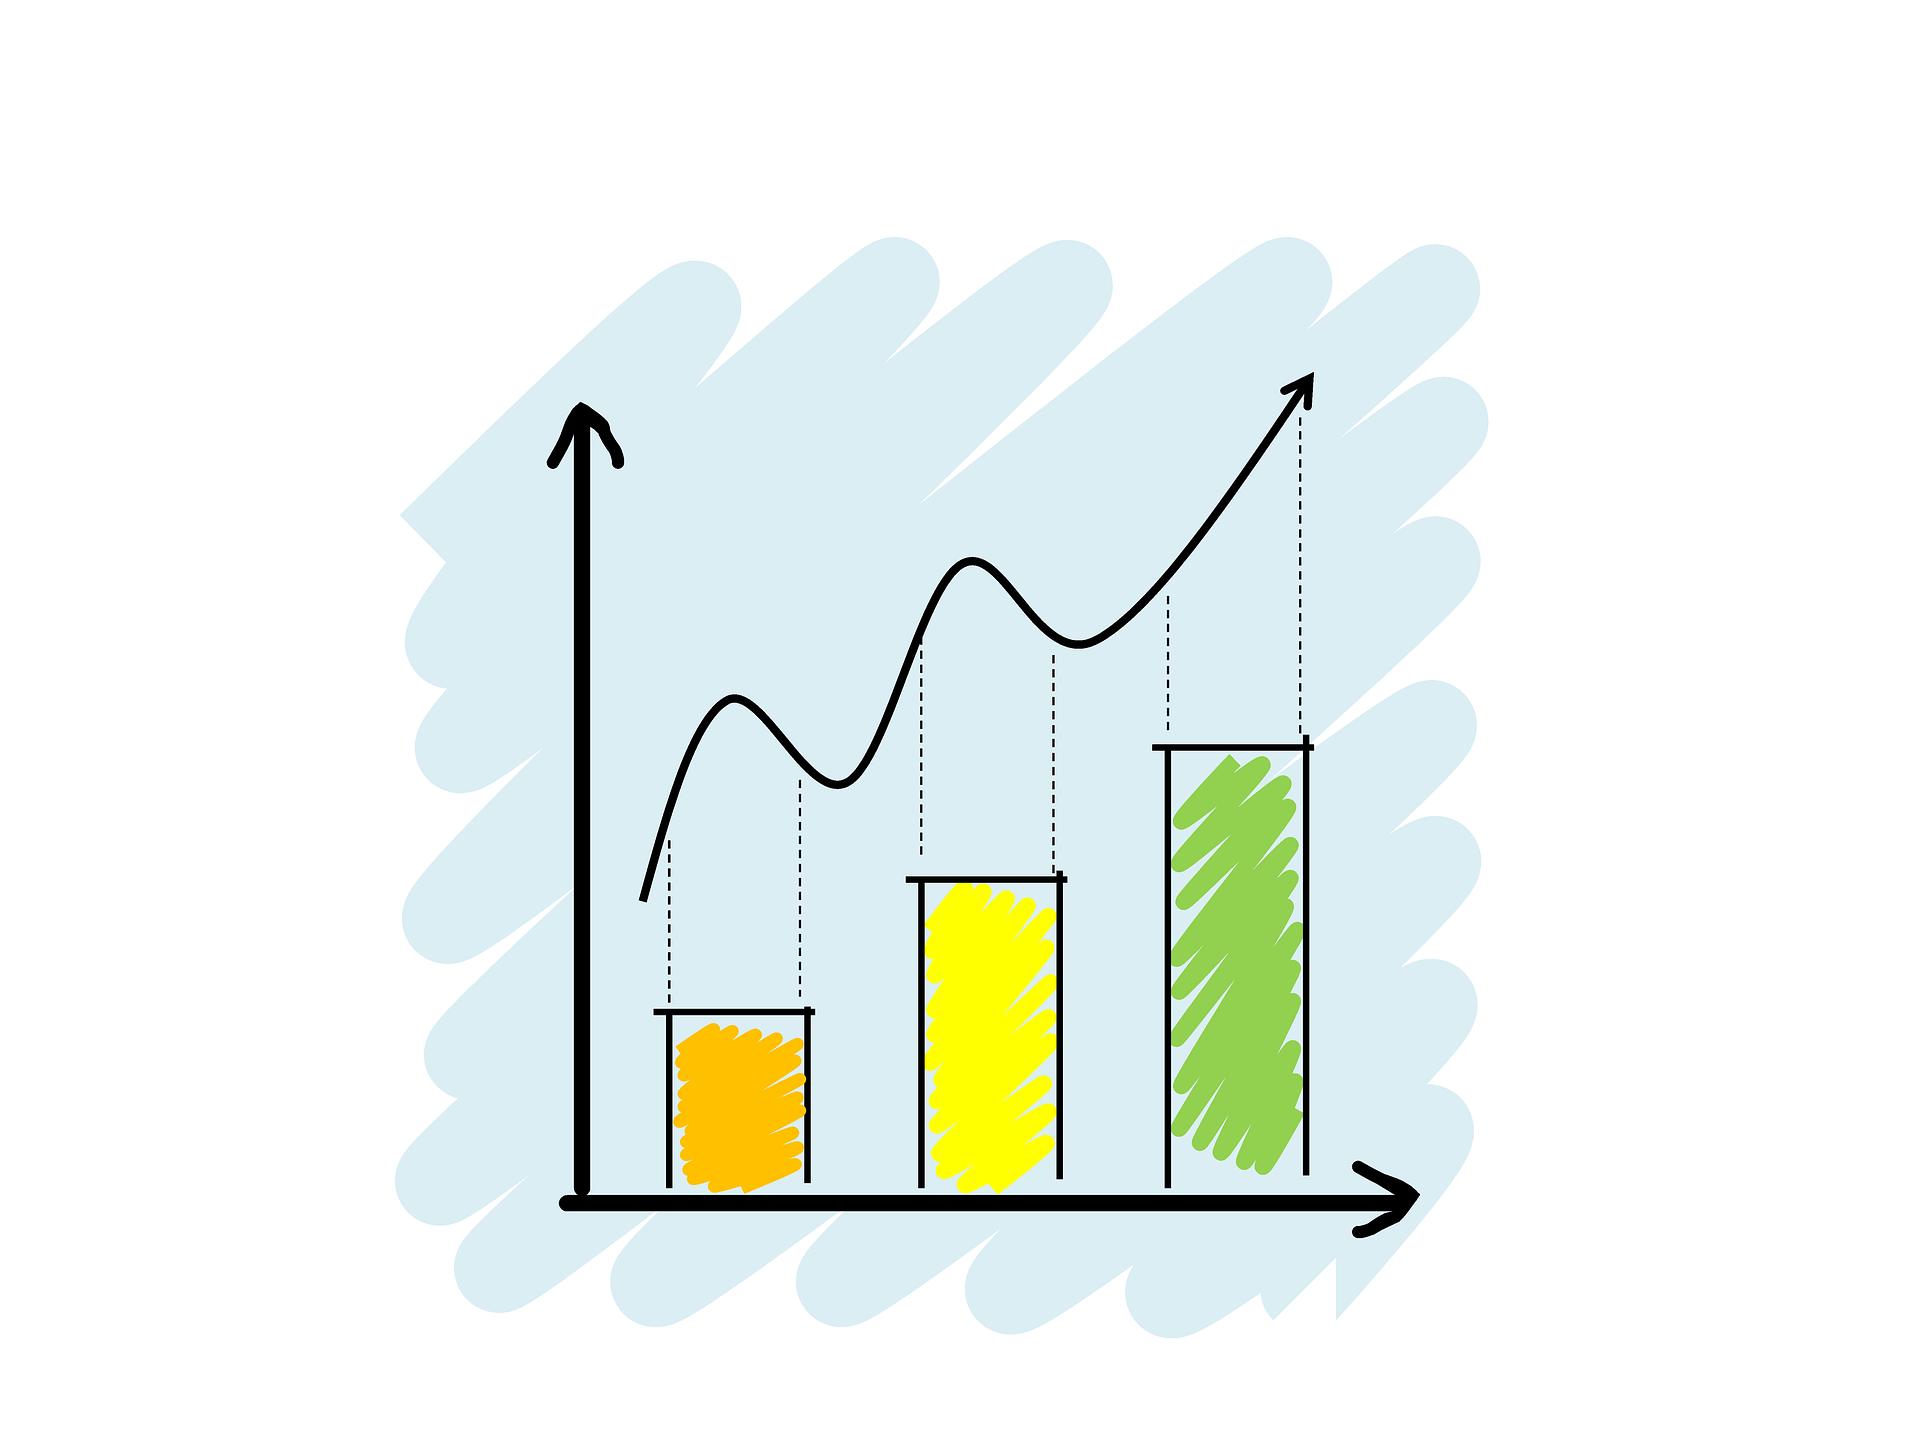 [WEEKLY RASSI] - 웹젠 +24% 수익 실현 - 7월 1째주 라씨 AI매매성과